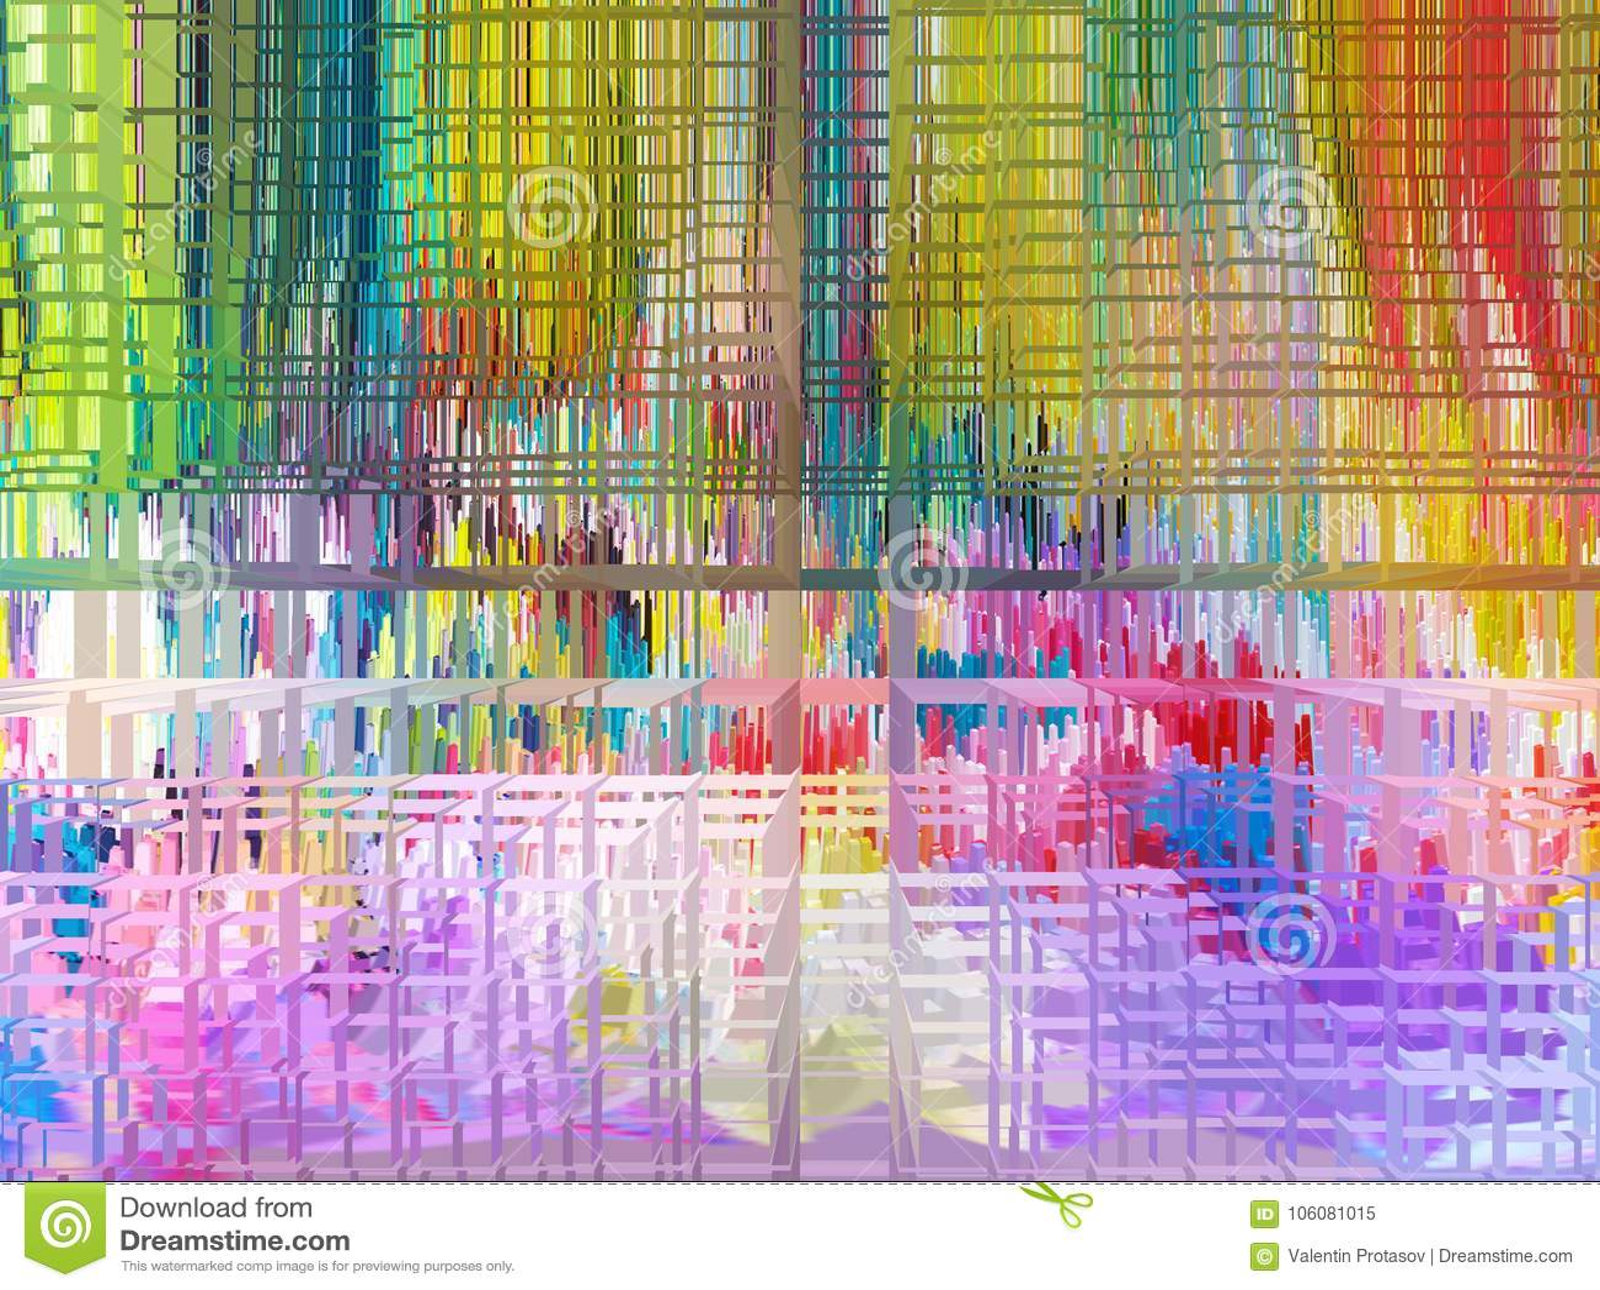 Abstracção Sumário Textura textured uniqueness abstractions sumários texturas